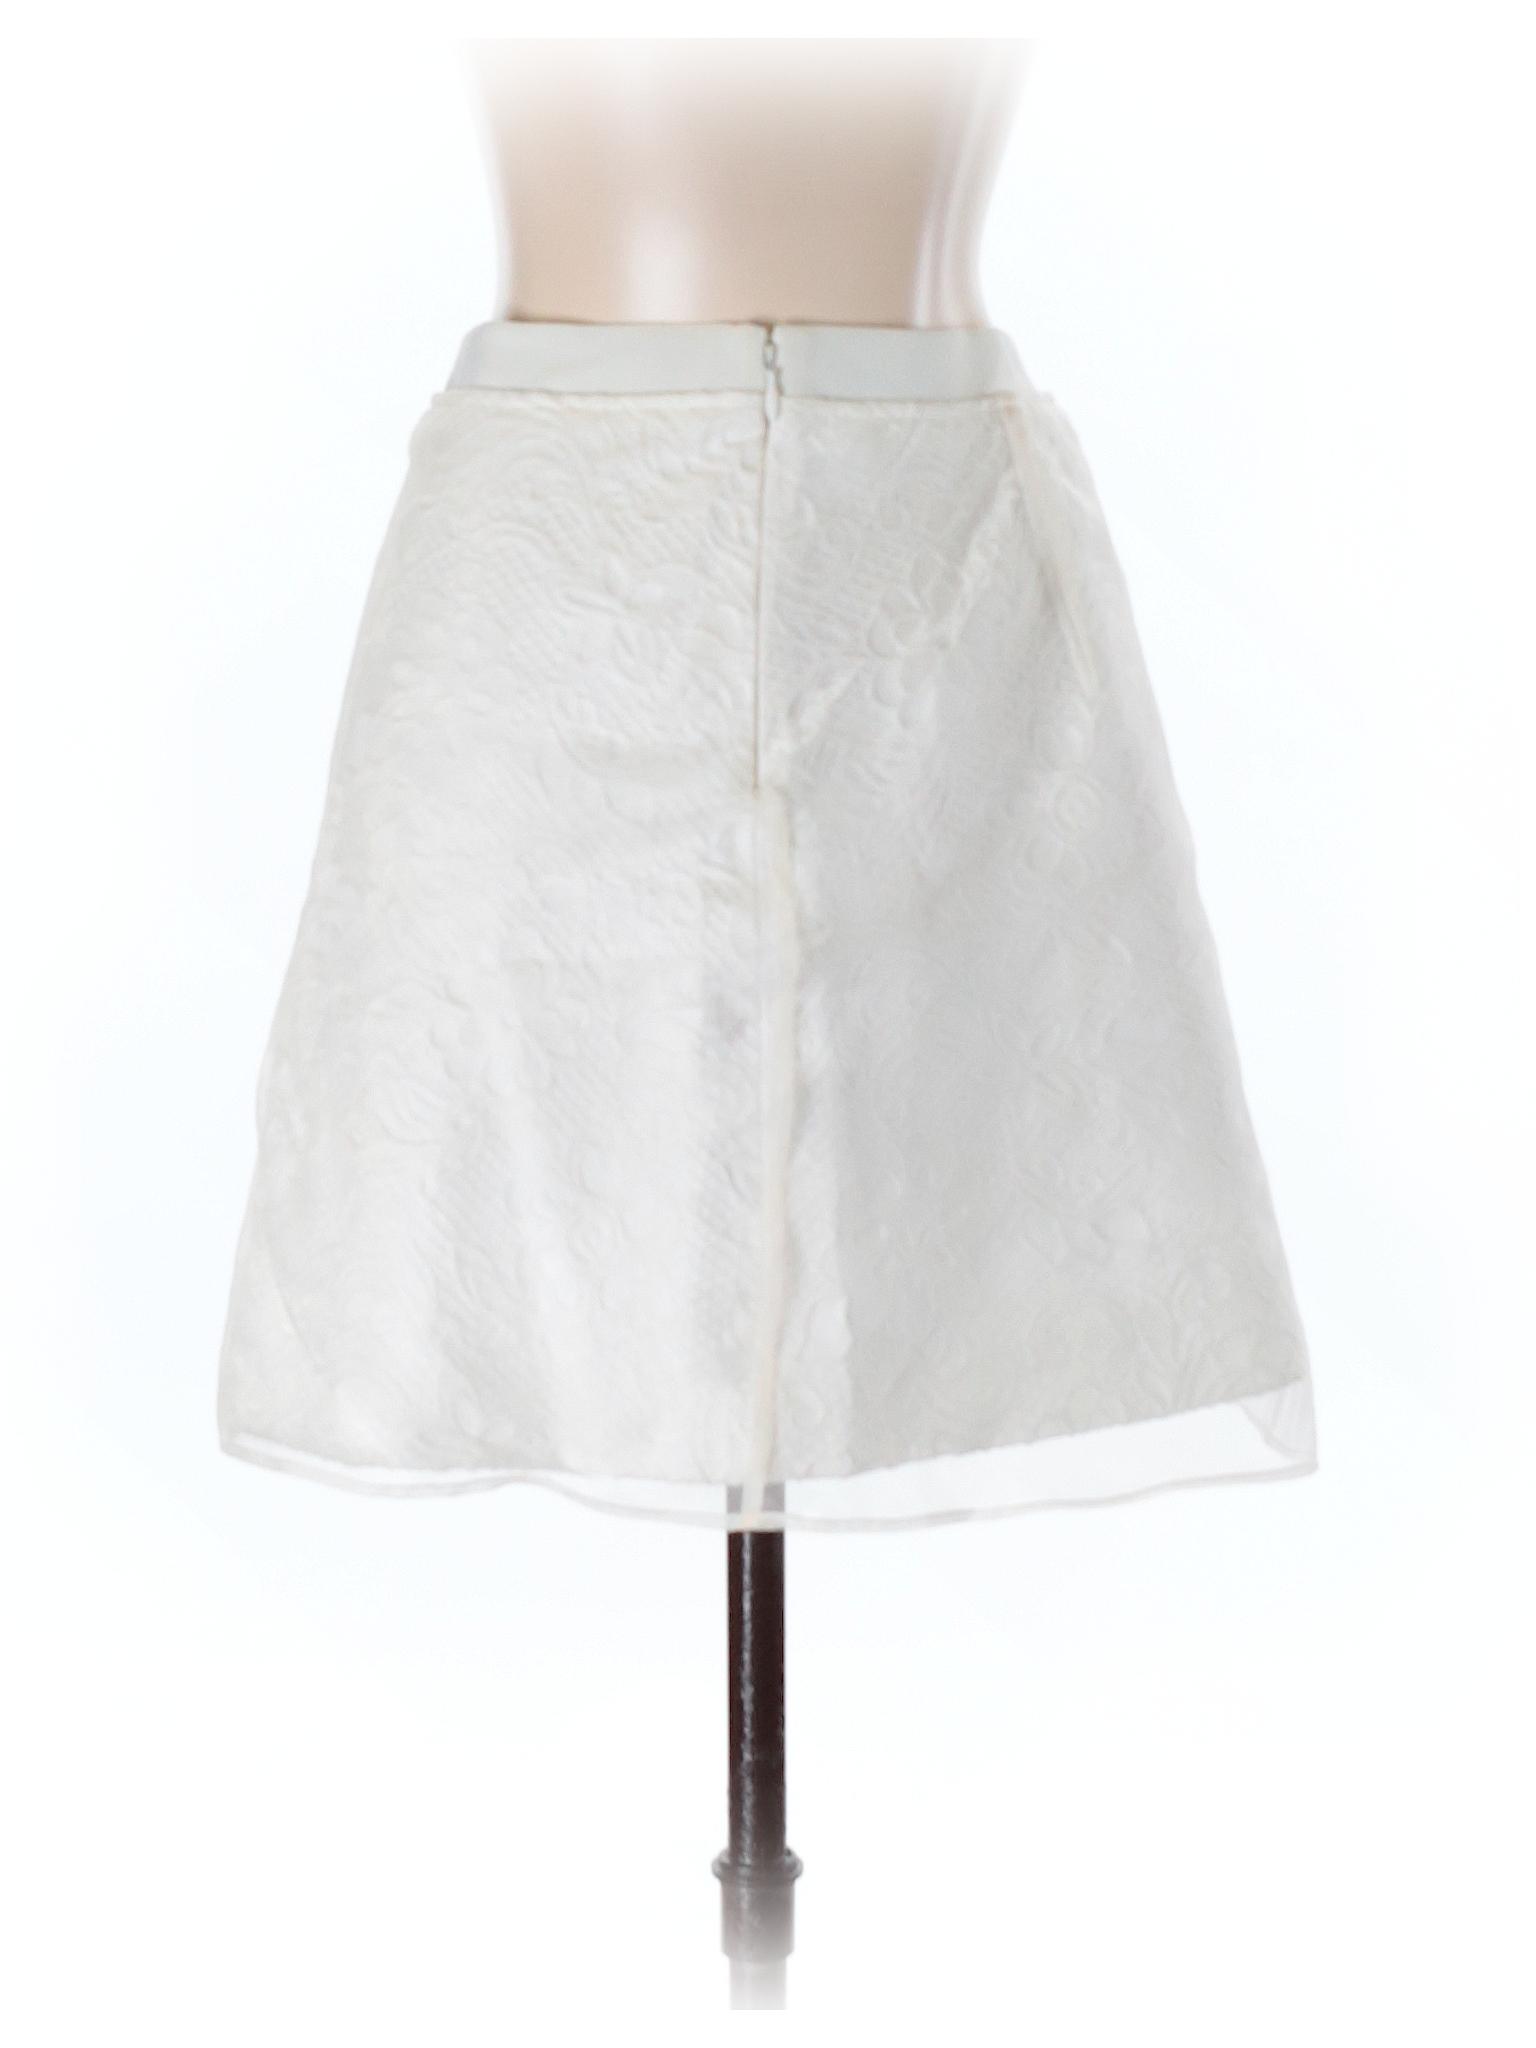 Skirt Casual Skirt Skirt Casual Boutique Skirt Boutique Skirt Casual Boutique Boutique Boutique Casual Casual Boutique AqFO88w